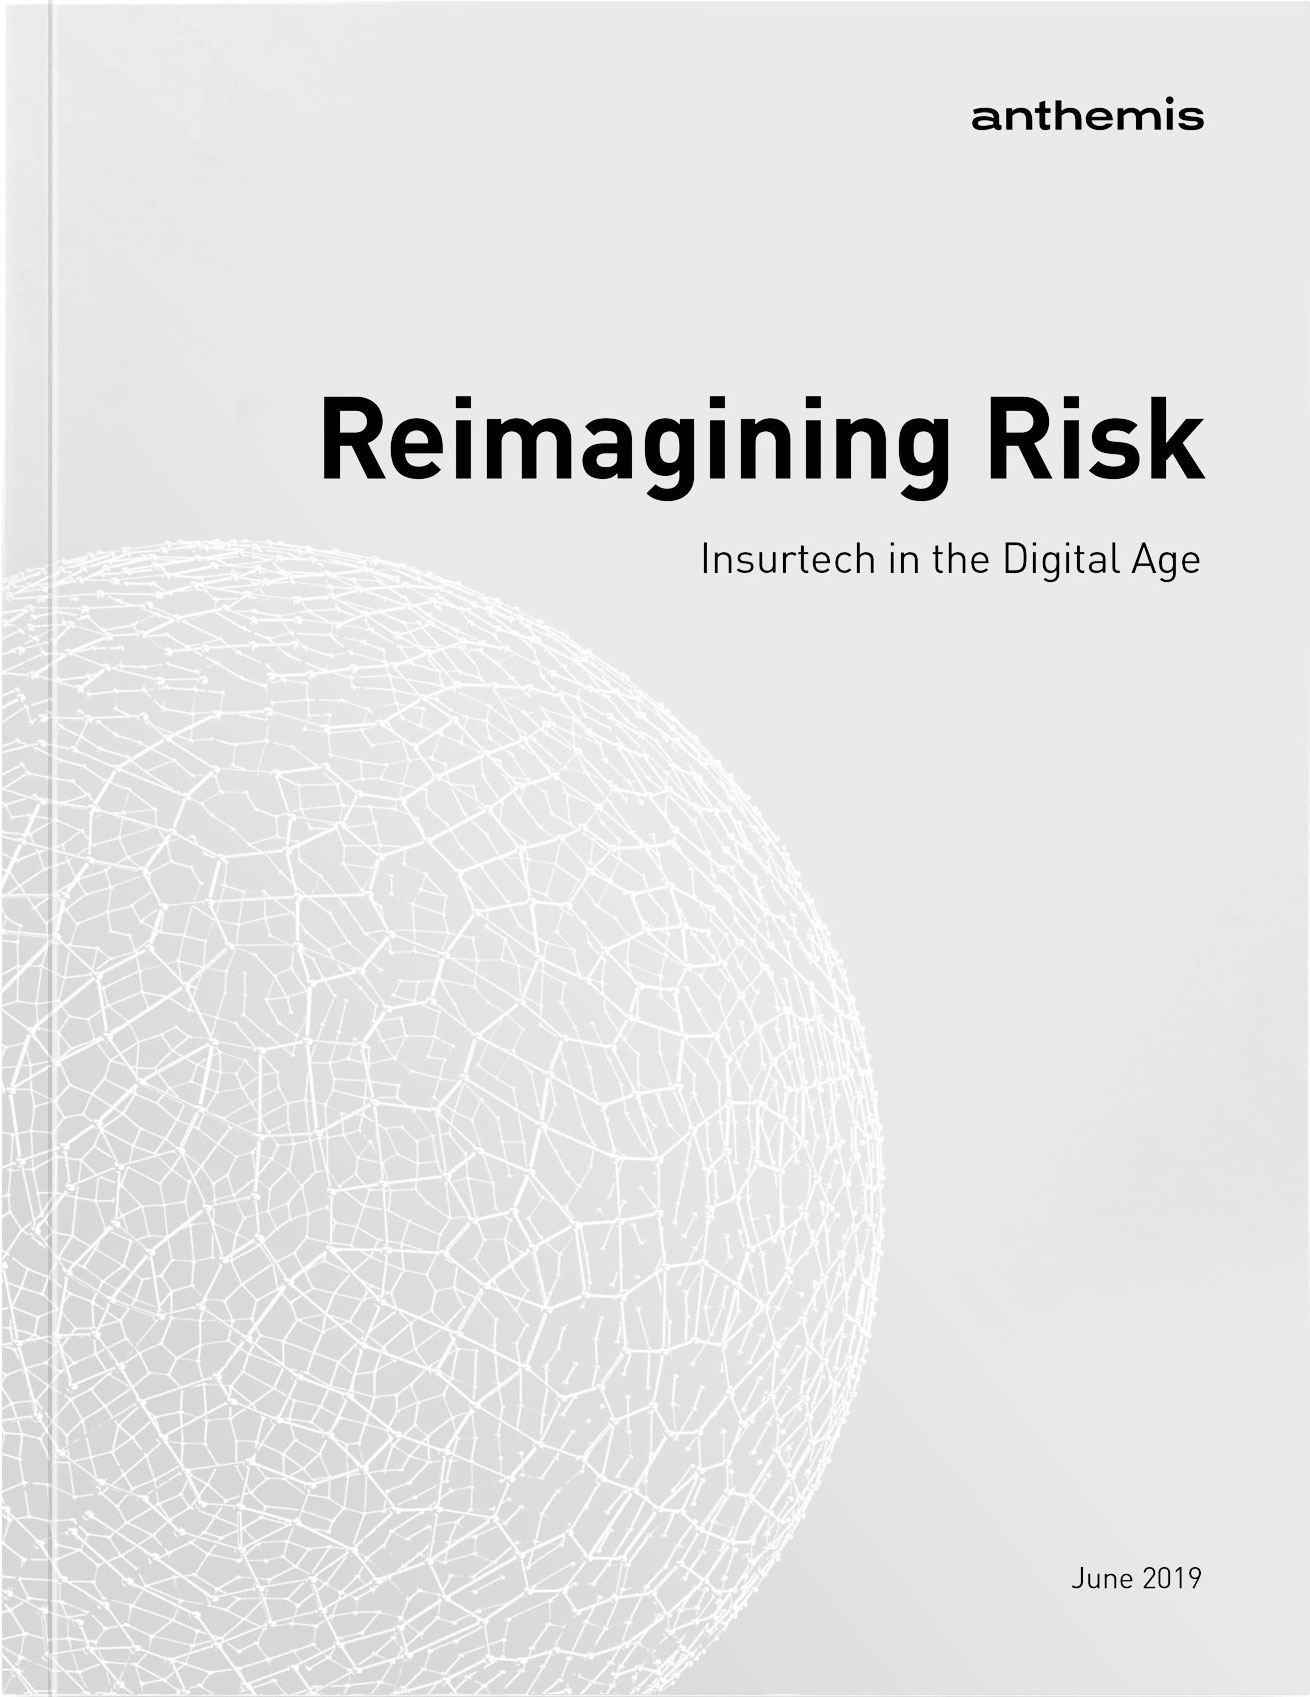 reimagining-risk-insurtech-in-the-digital-age-june-2019-cover